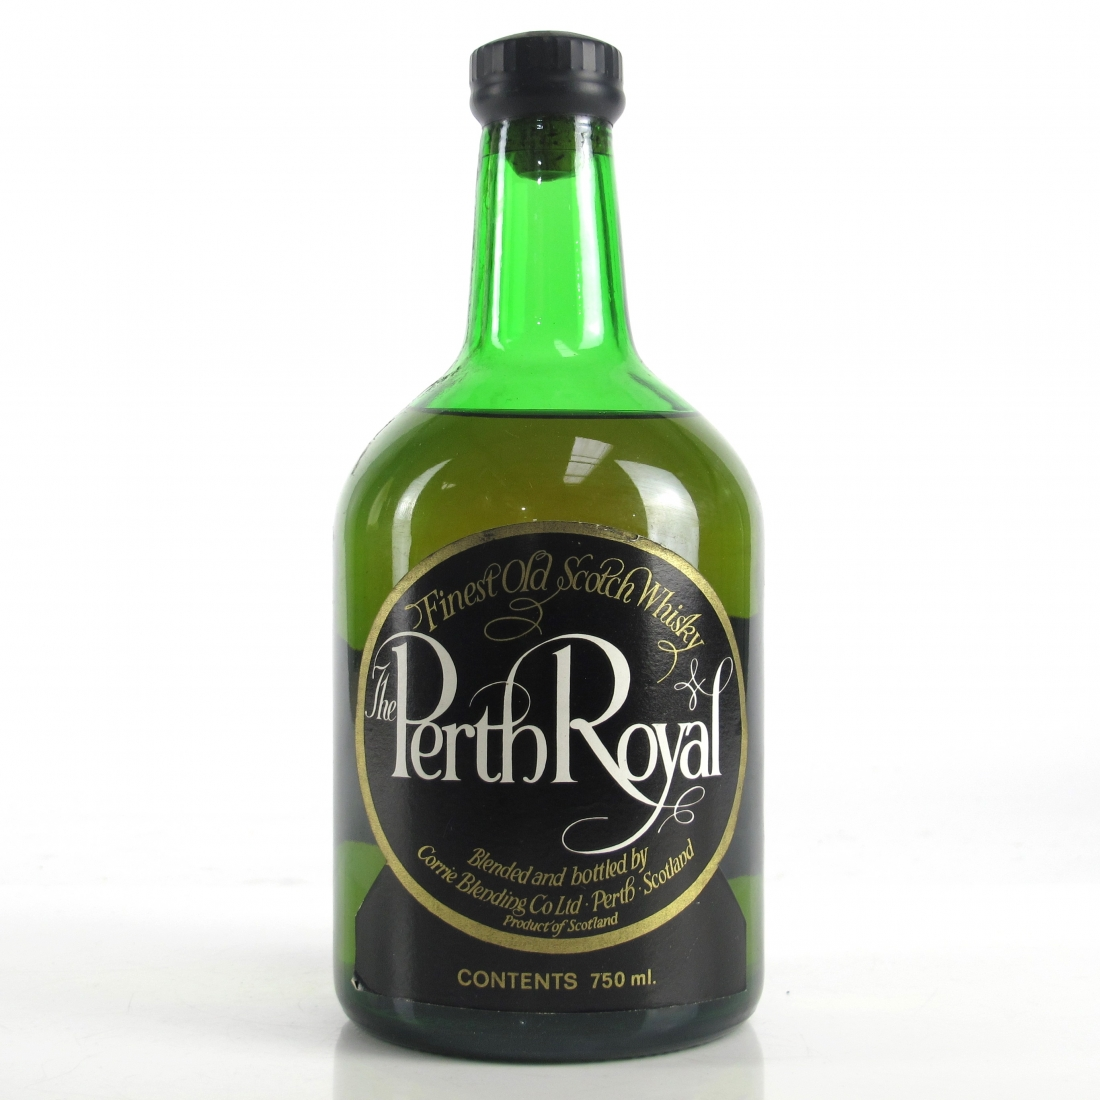 Perth Royal 1970s